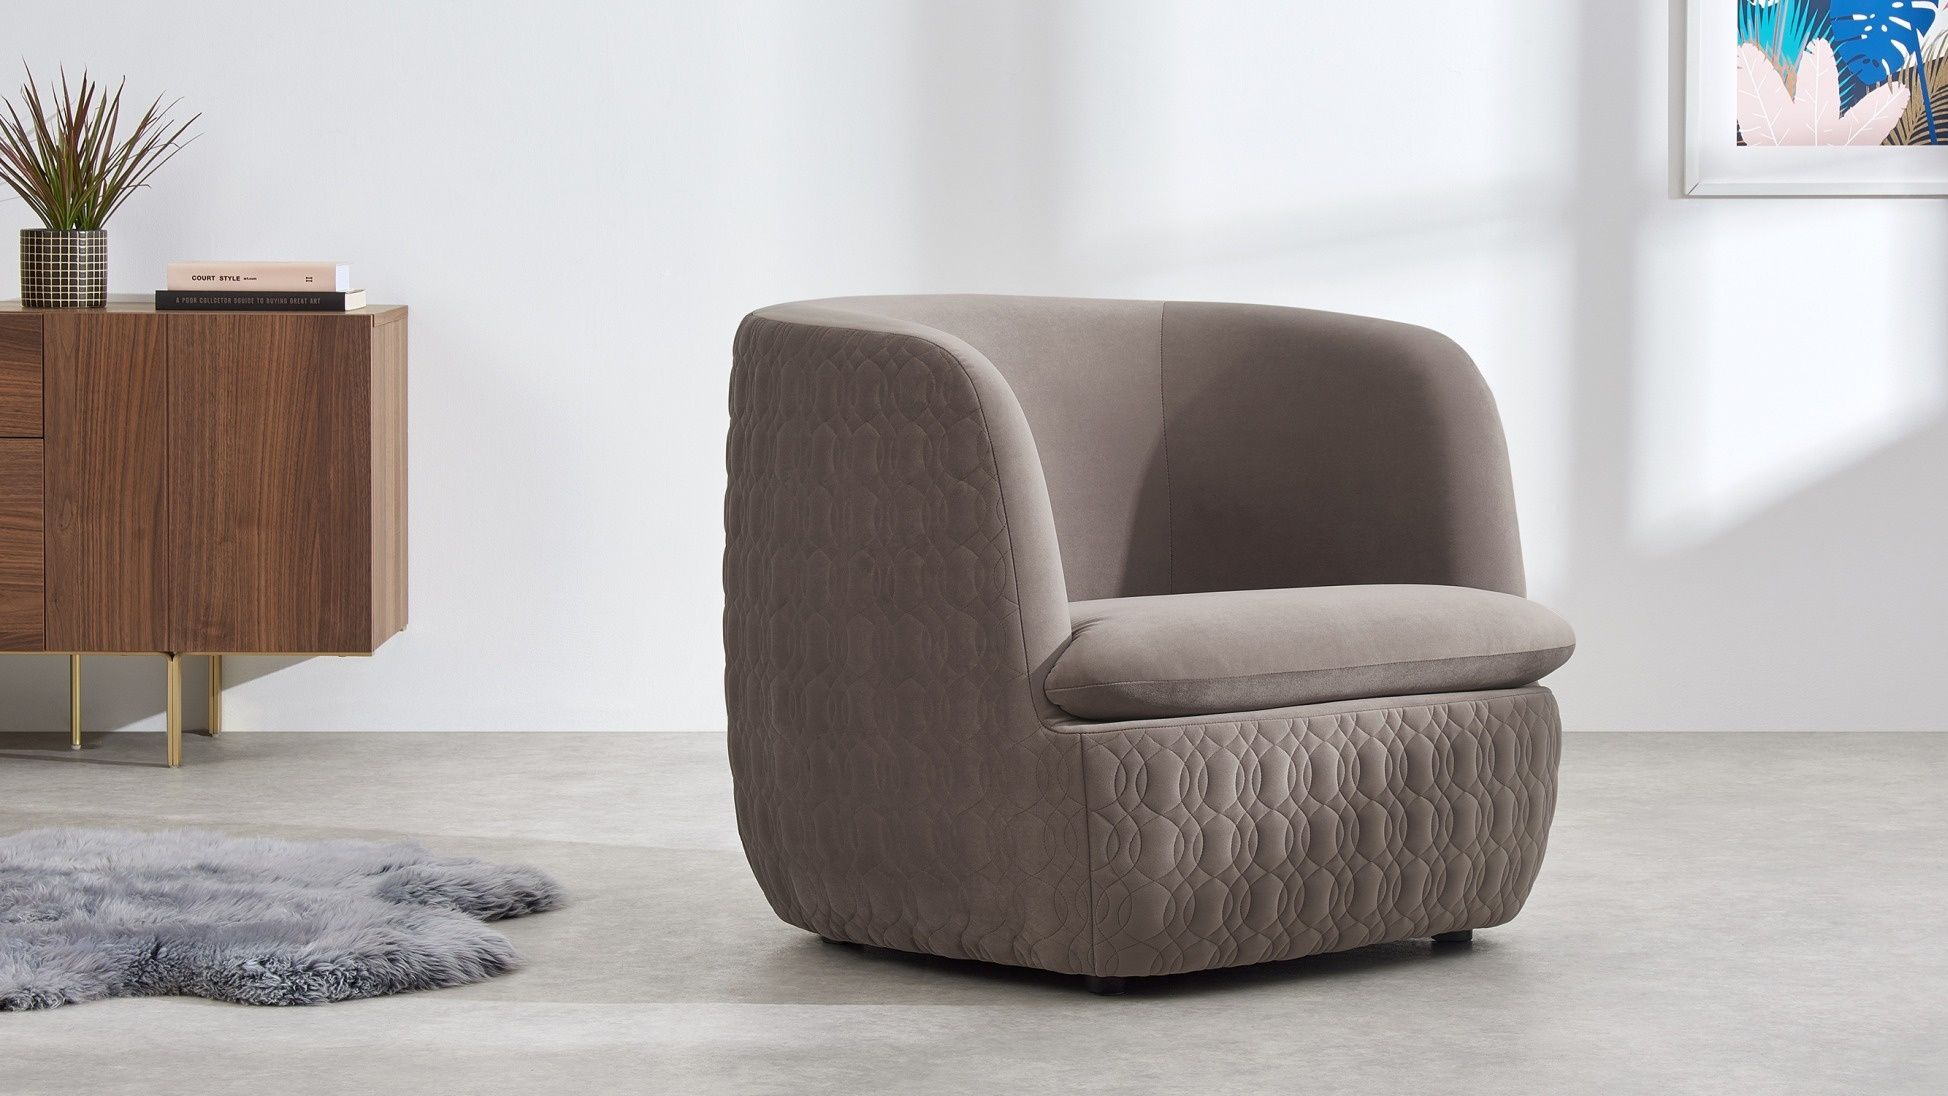 Leuke Design Fauteuil.Verlopen Win Made Com Fauteuil Van Zacht Fluweel T W V 499